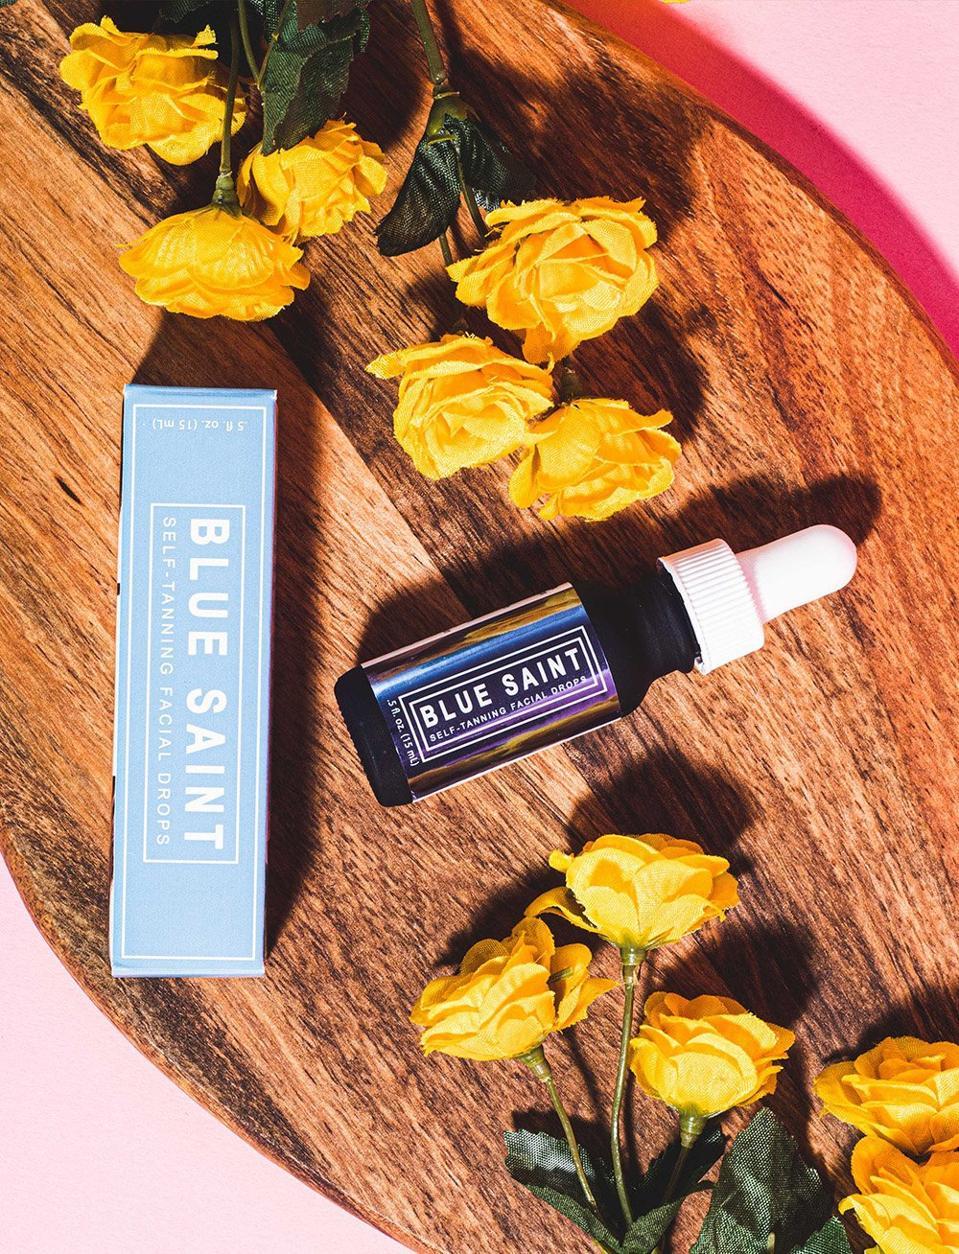 BLUE SAINT Face Self Tanning Drops